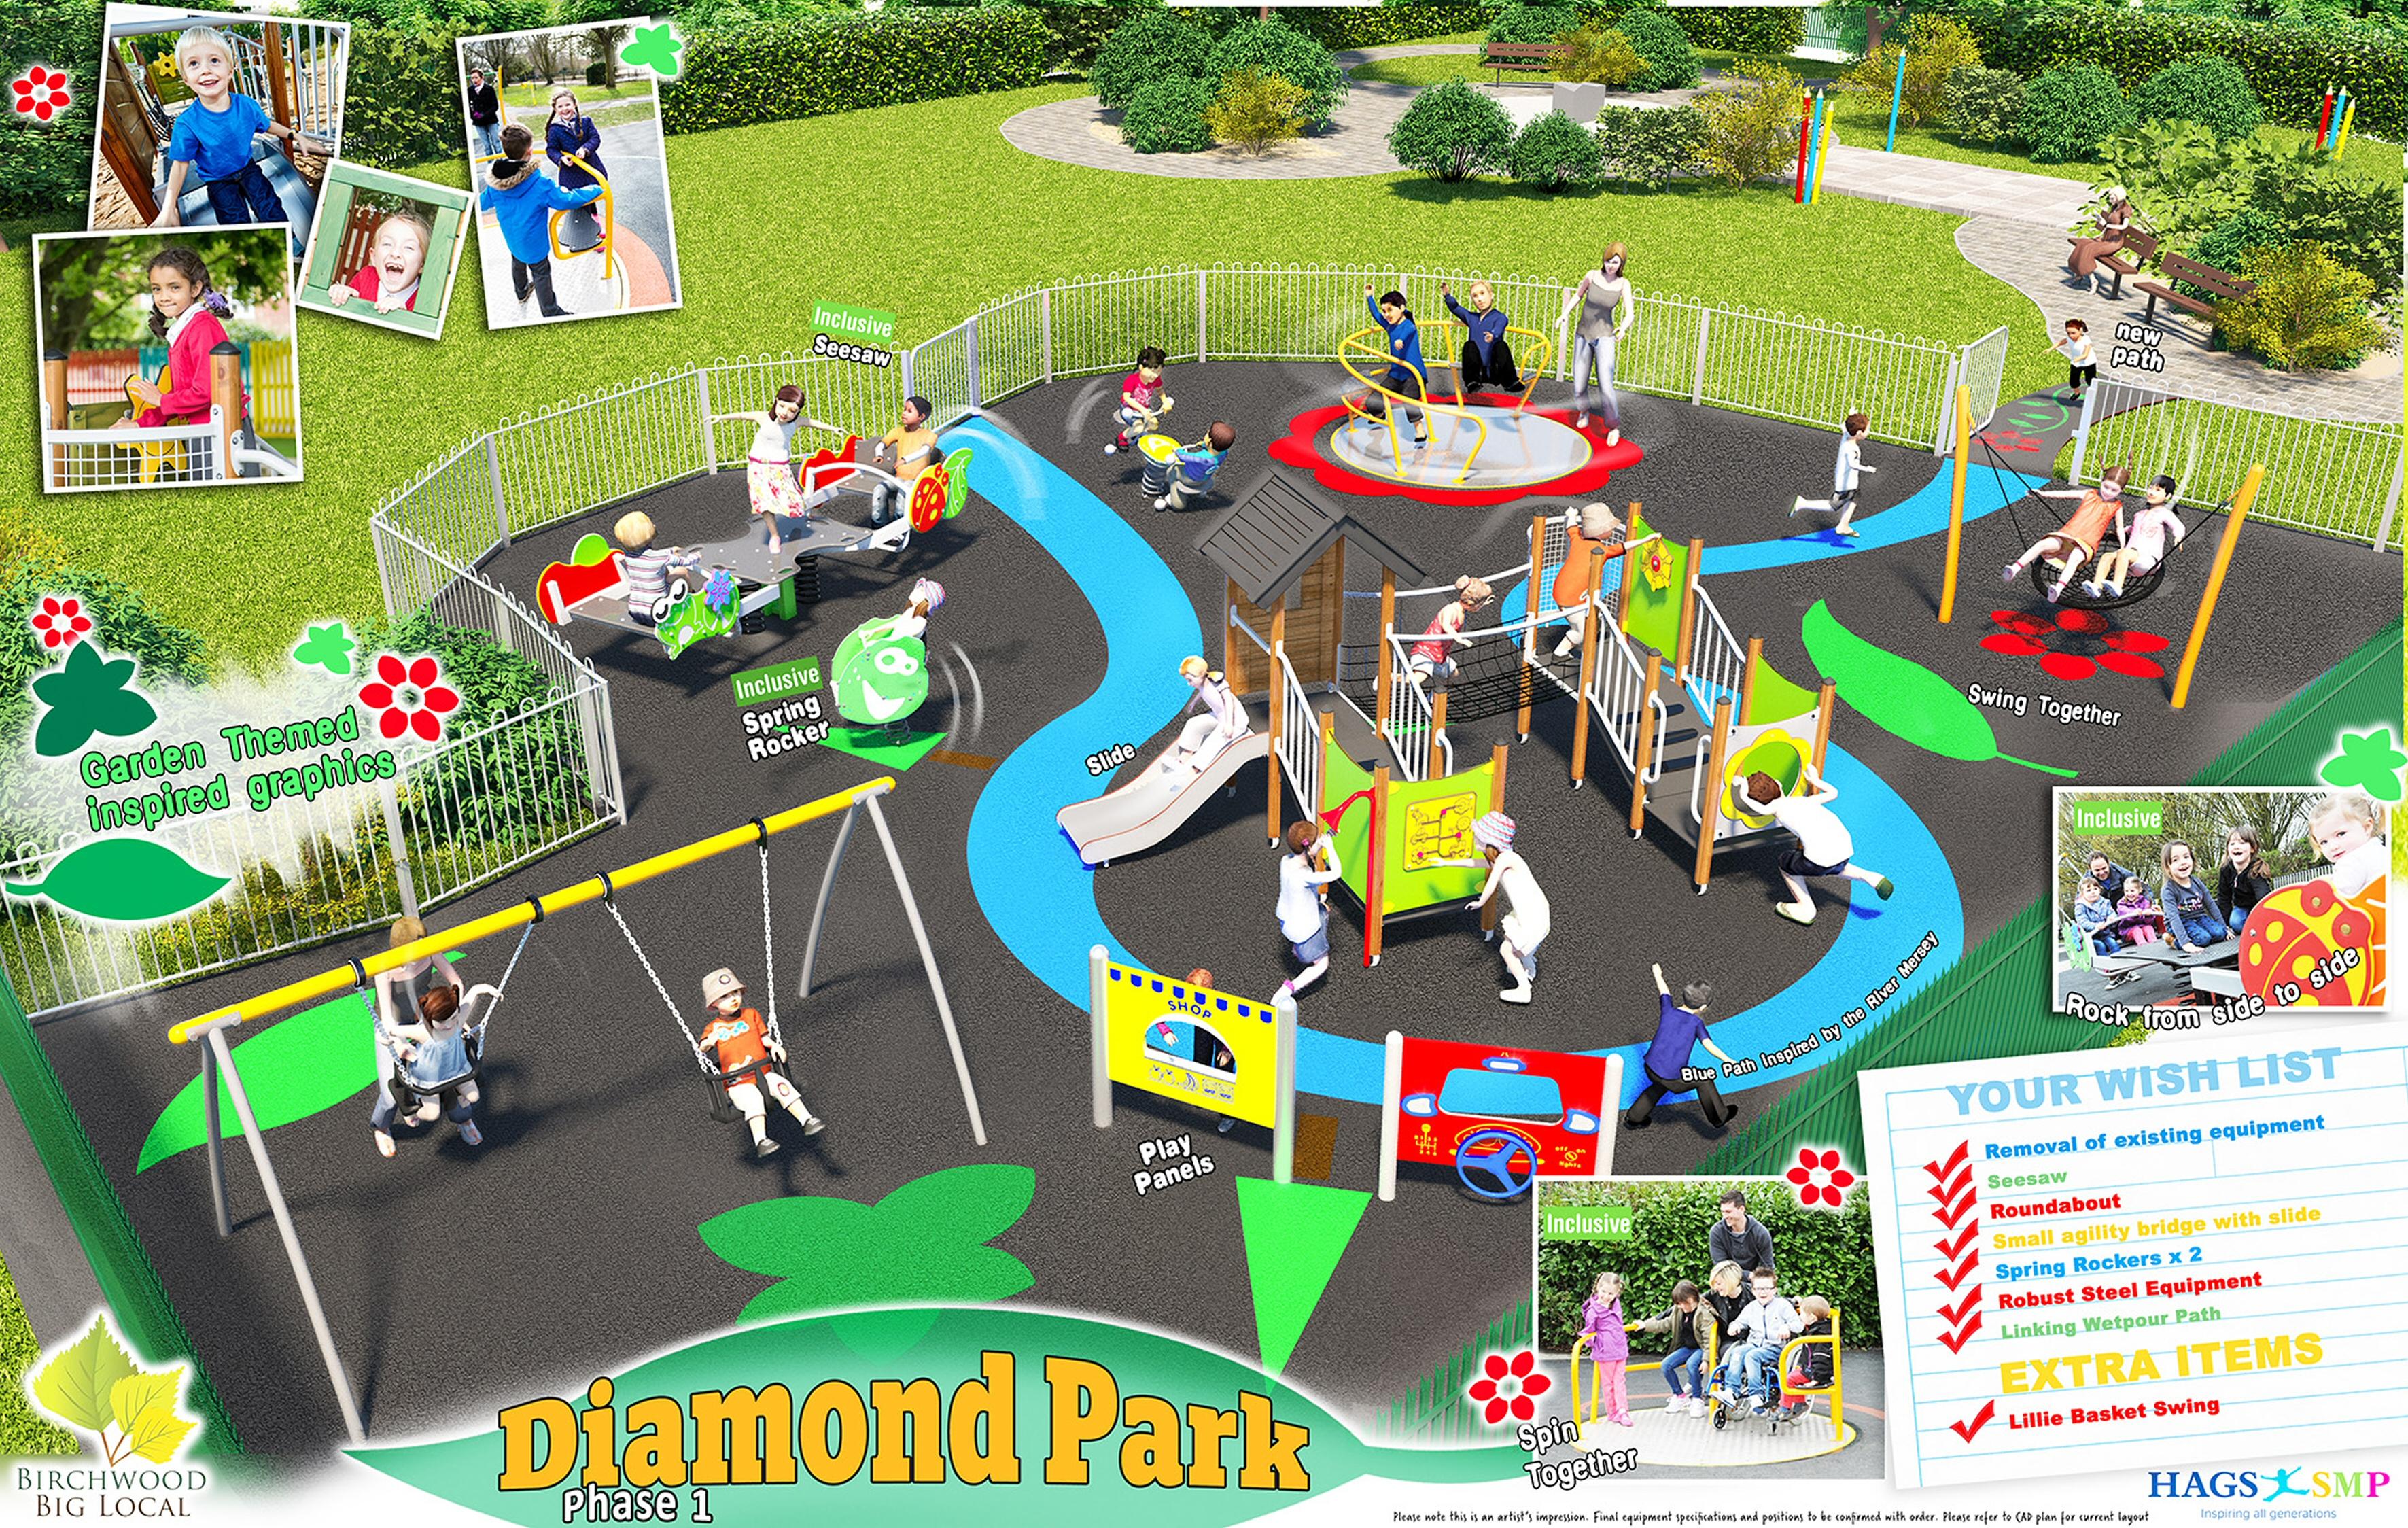 Diamond Park Phase 1